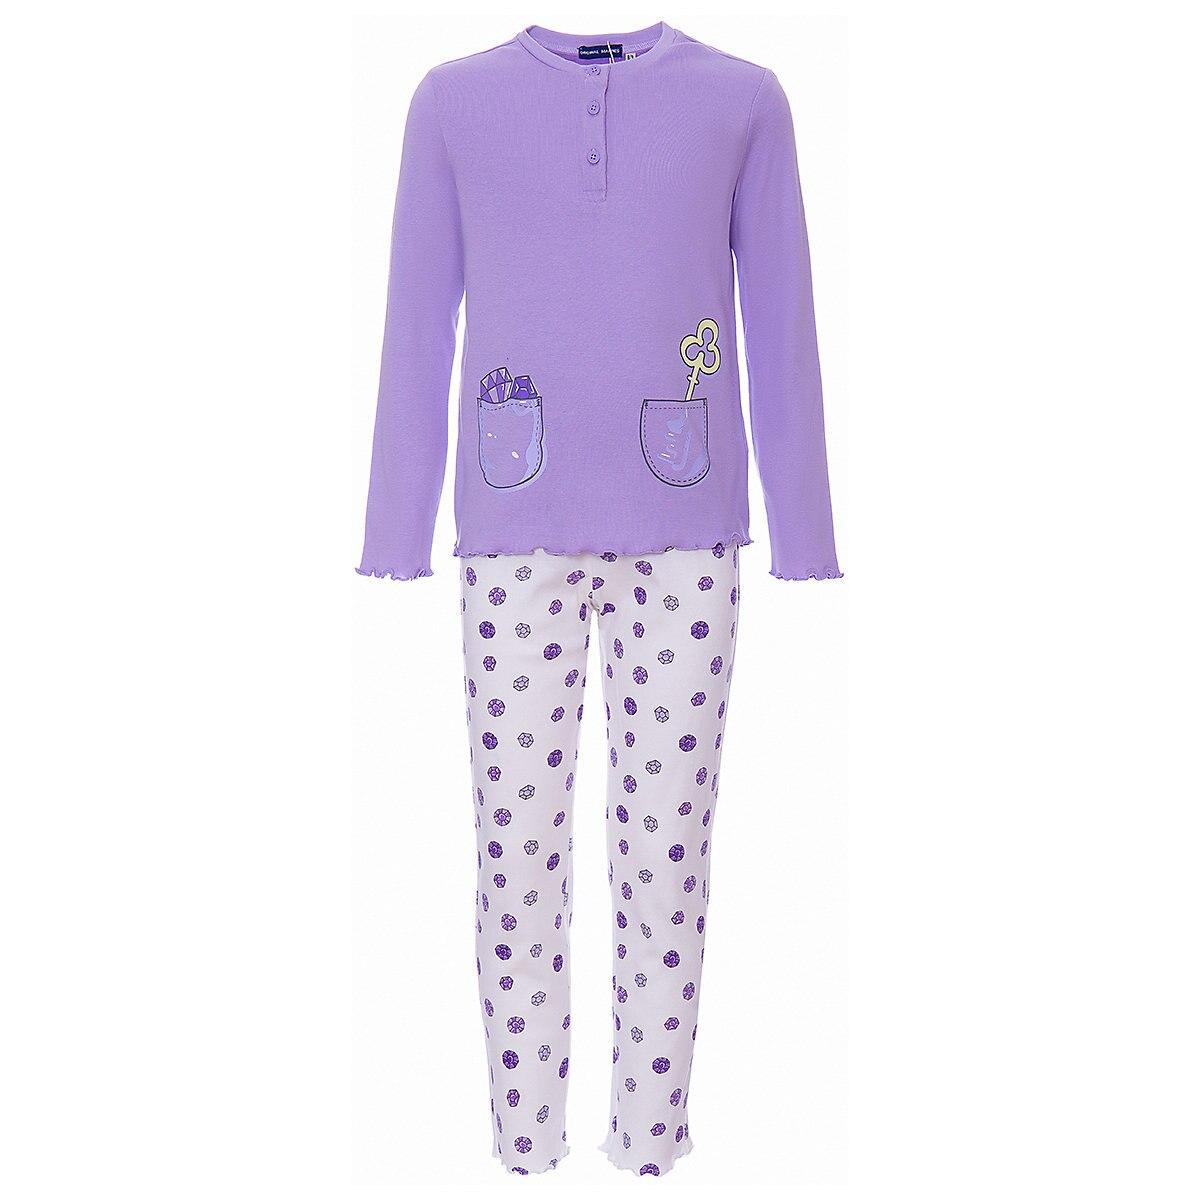 ORIGINAL MARINES Pajama Sets 9501094 Cotton Girls childrens clothing Sleepwear Robe parrot print cami pajama set with robe